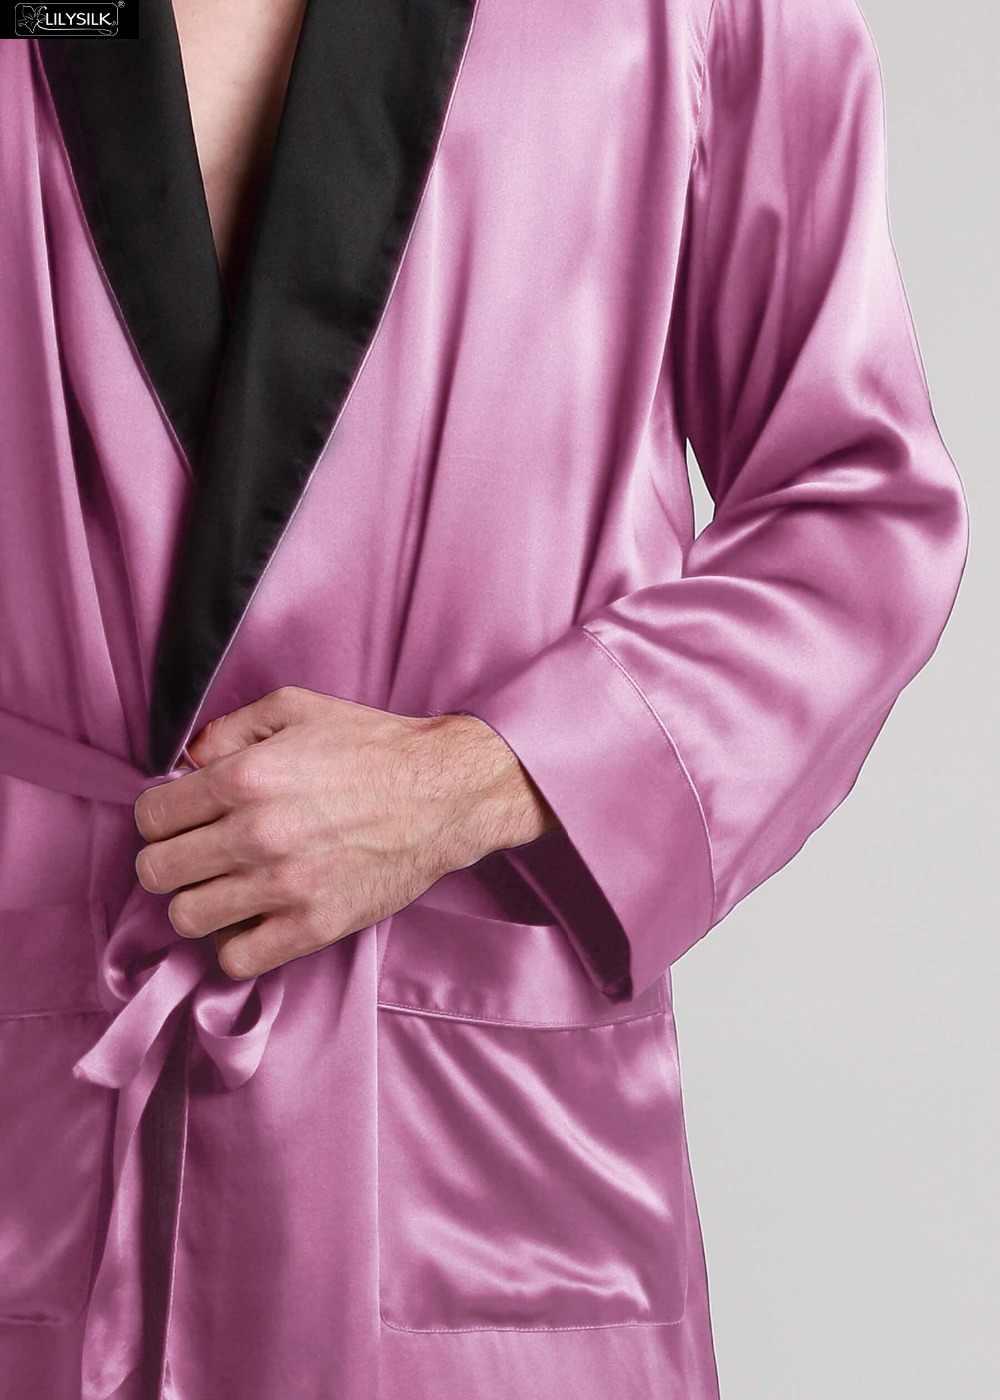 LilySilk ローブパジャマ着物男性純粋な 100 シルク 22 匁長袖コントラストカラー高級クリアランス販売送料無料